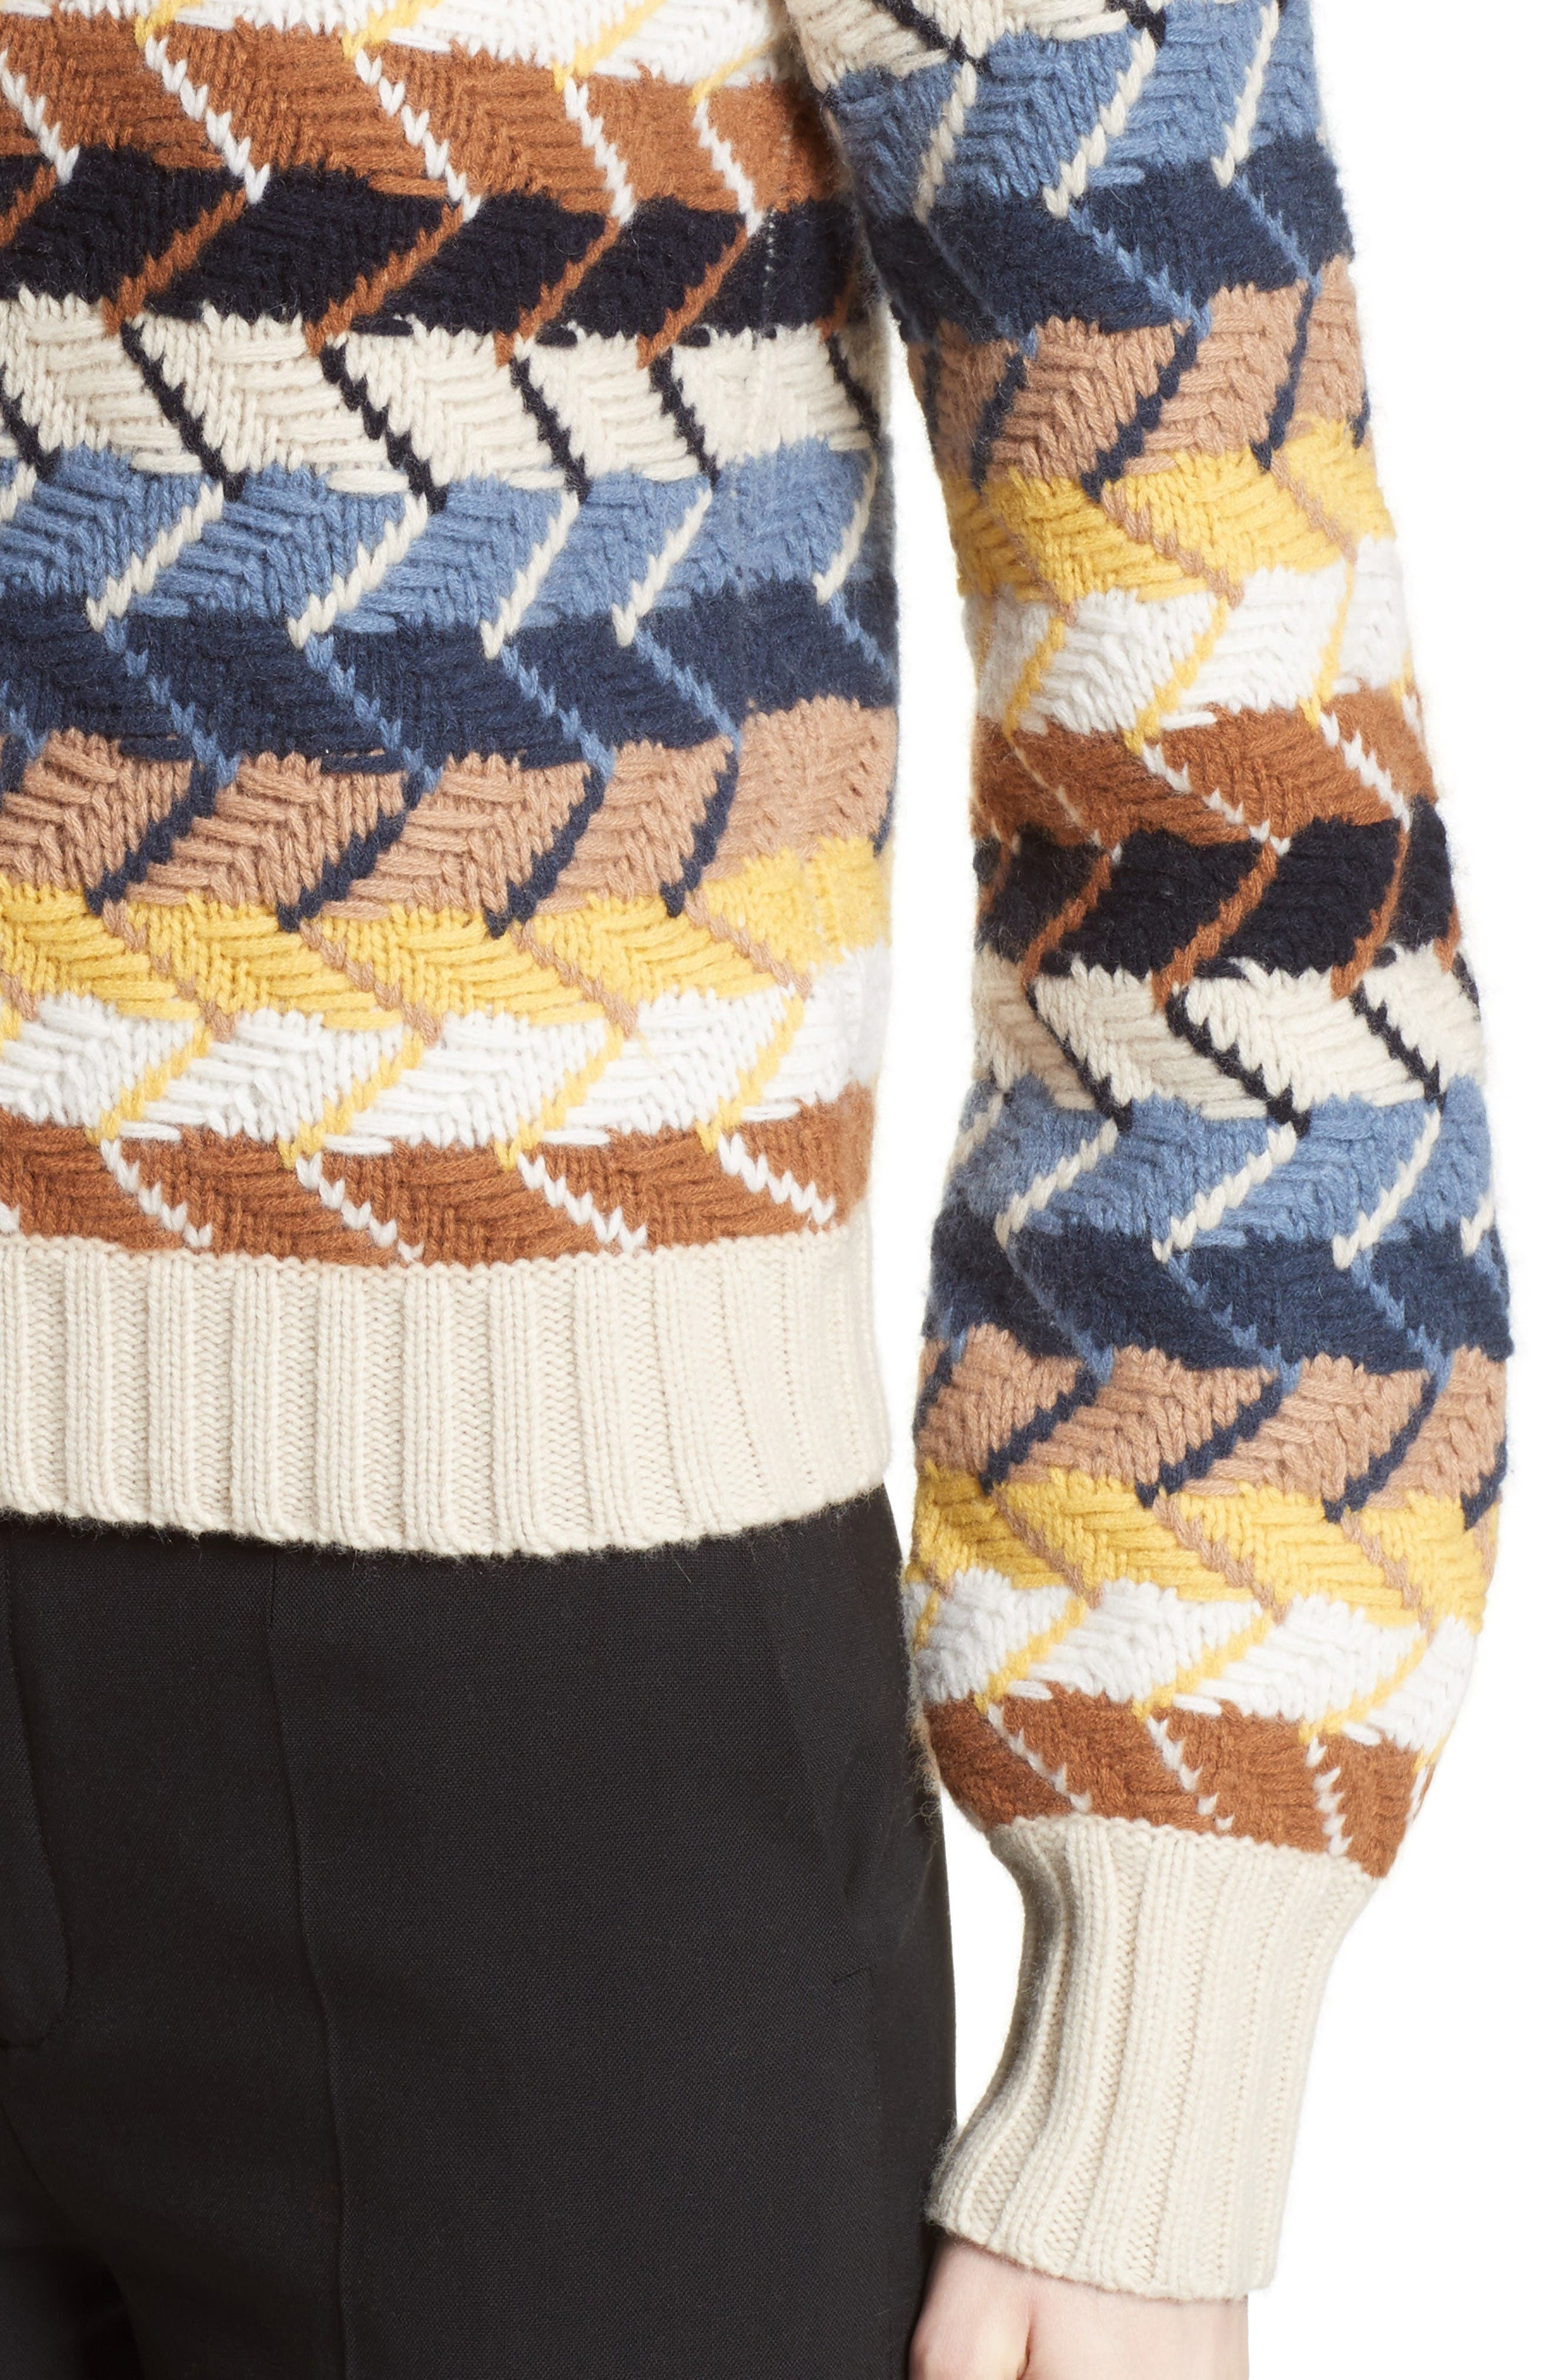 Herringbone Wool & Cashmere Turtleneck Sweater,                             Alternate thumbnail 6, color,                             Multicolor Blue